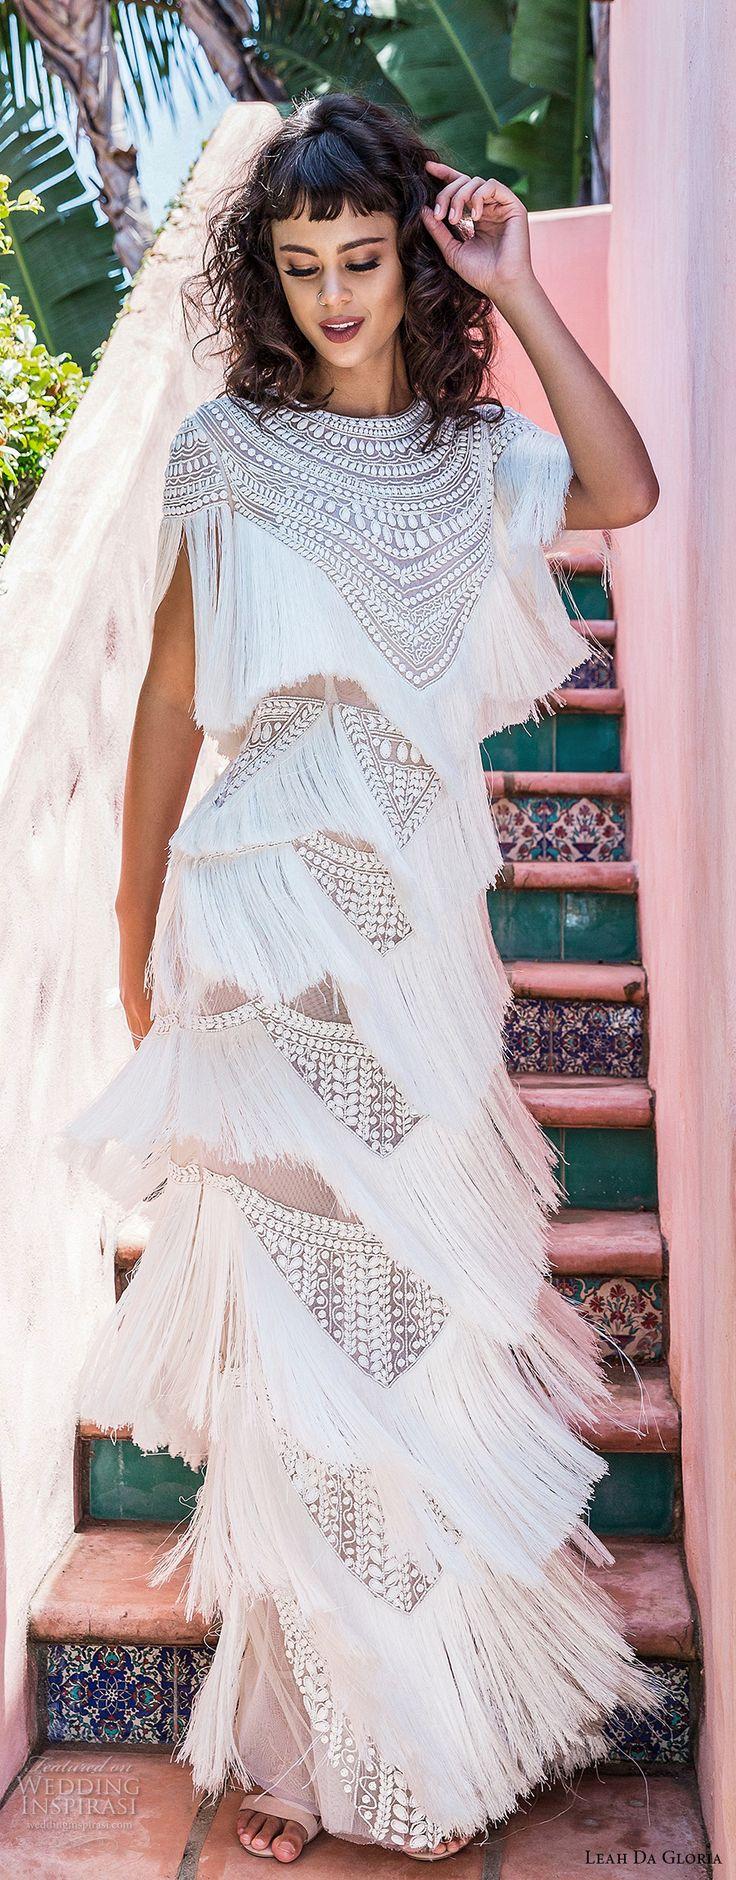 leah da gloria 2017 bridal cap sleeves jewel neckline fully embellishment fringes layered skirt bohemian column wedding dress (mia) mv -- Leah Da Gloria 2017 Wedding Dresses